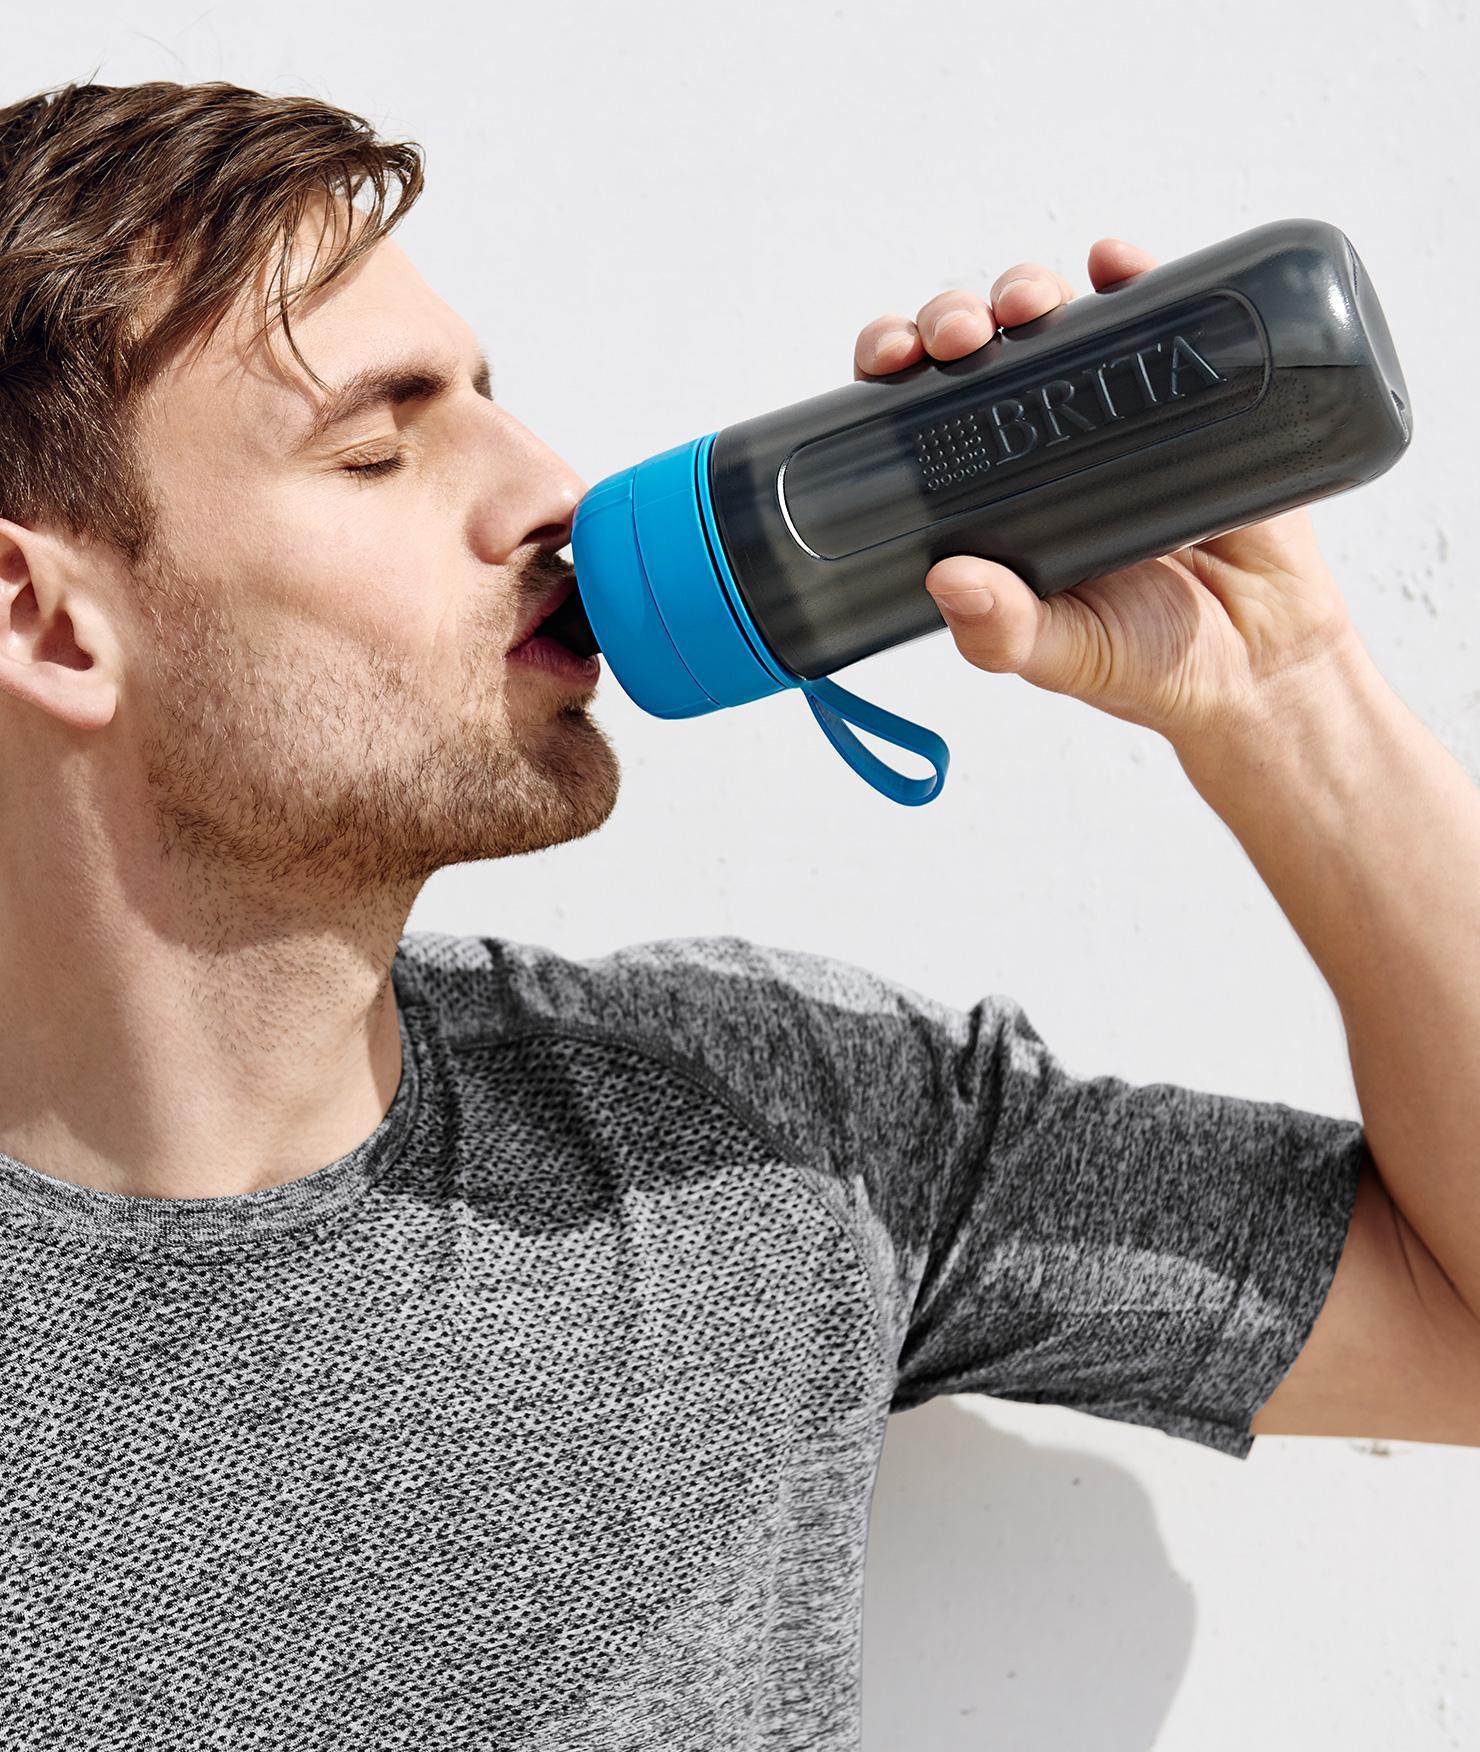 BRITA personal hydration needs man drinking water